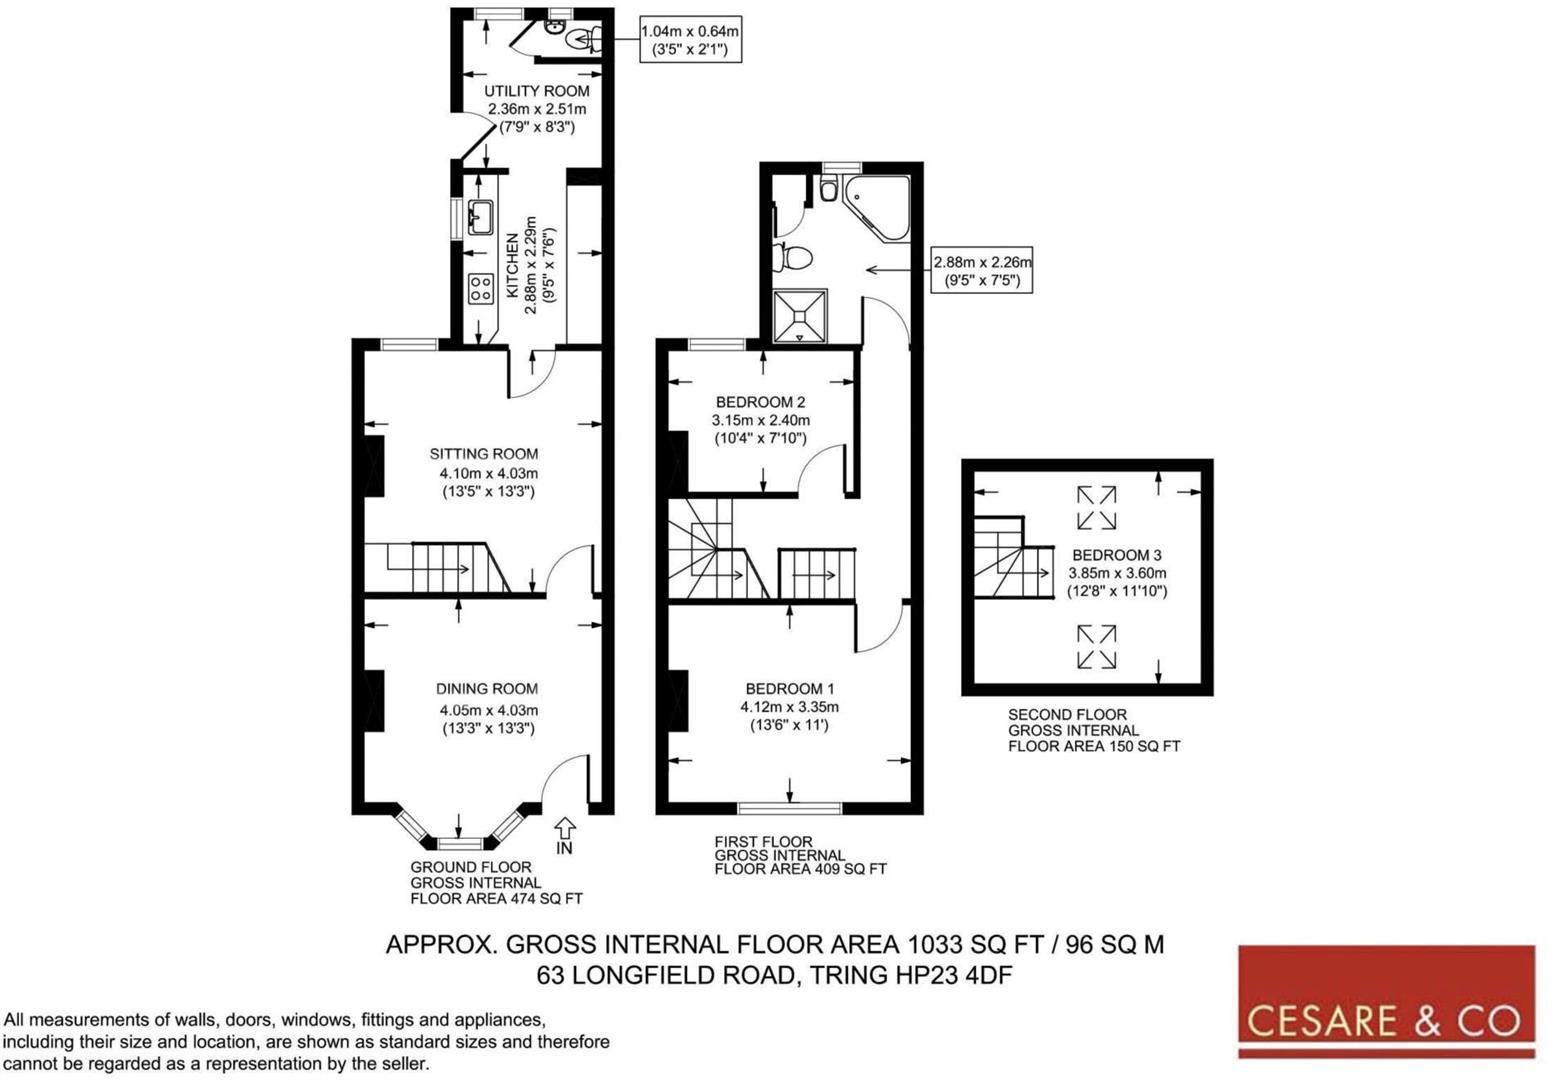 20654_10005200_CESA_FLP_01_0000 - floor plan.jpg